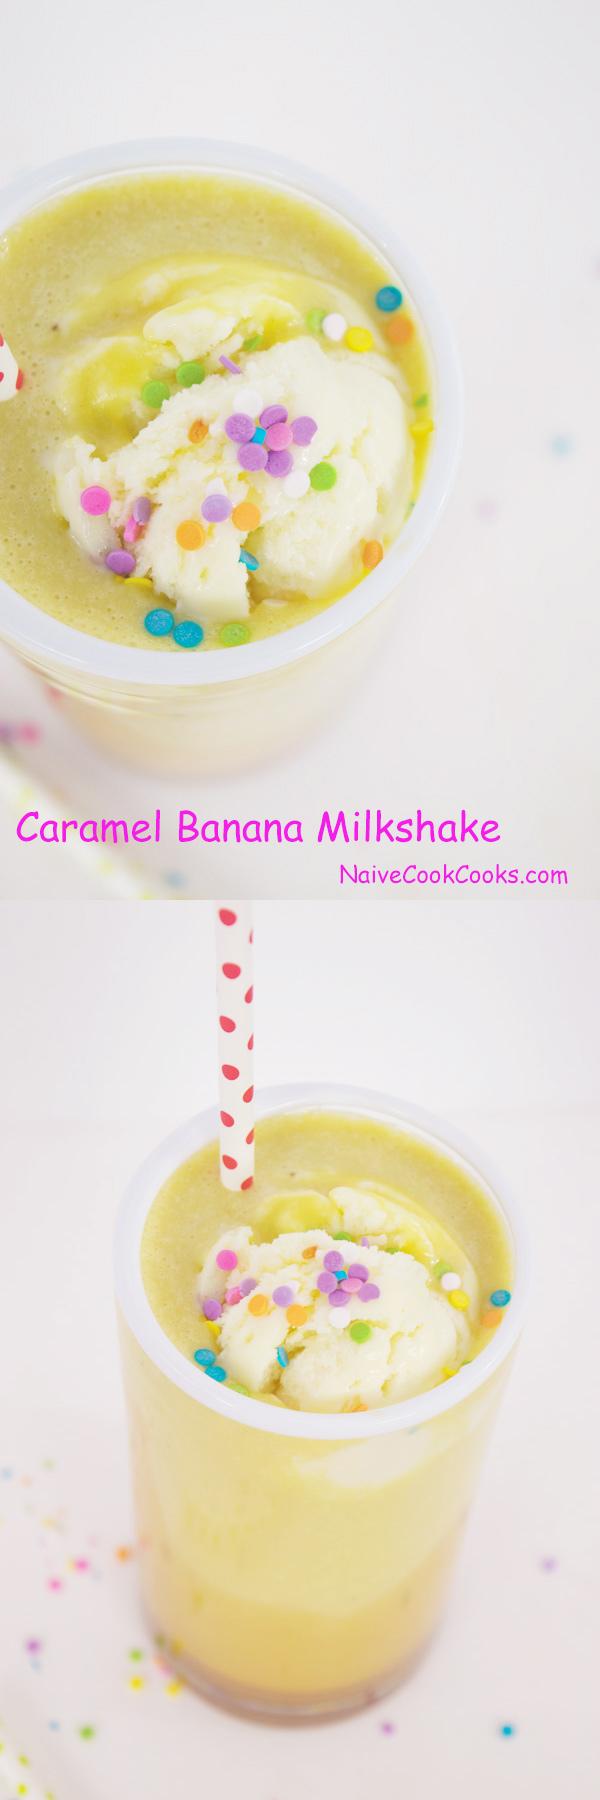 banana milkshake with caramel syrup